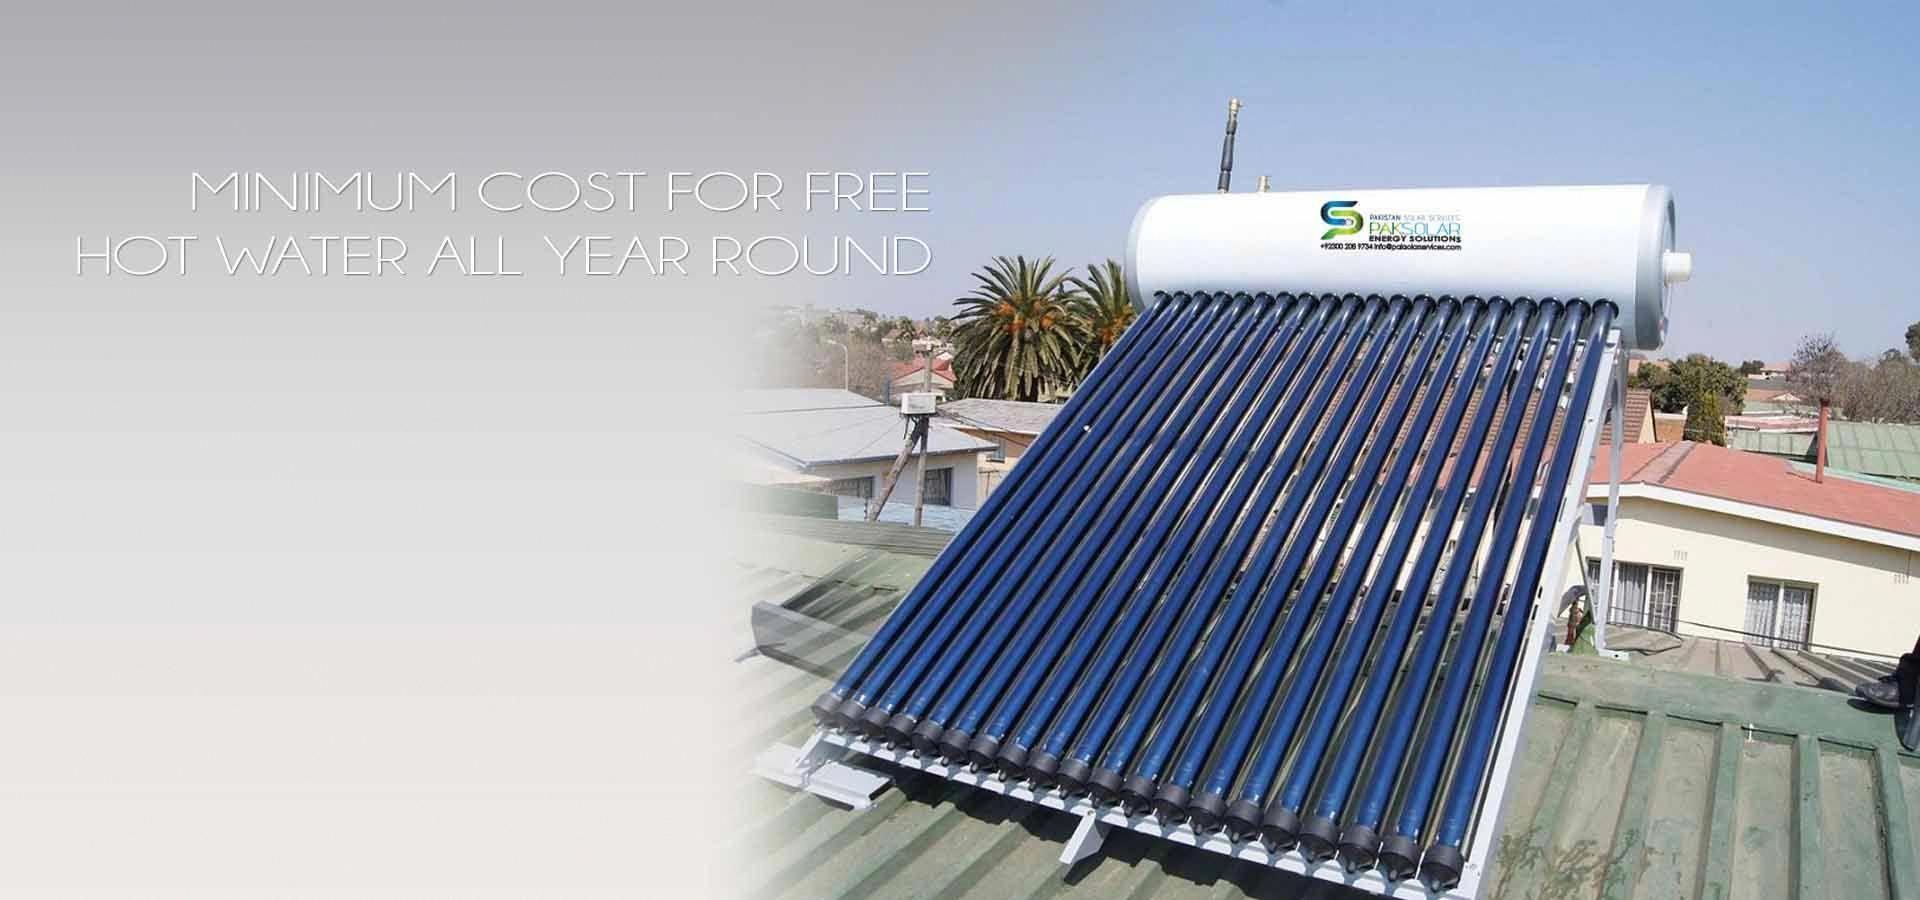 Solar Water Heater Low Cost Solar Geyser For Life Time Solarwaterheater Solarpanels Solarenergy Solarpower Solargenerator Sol In 2020 Solar Geyser Solar Panels Solar